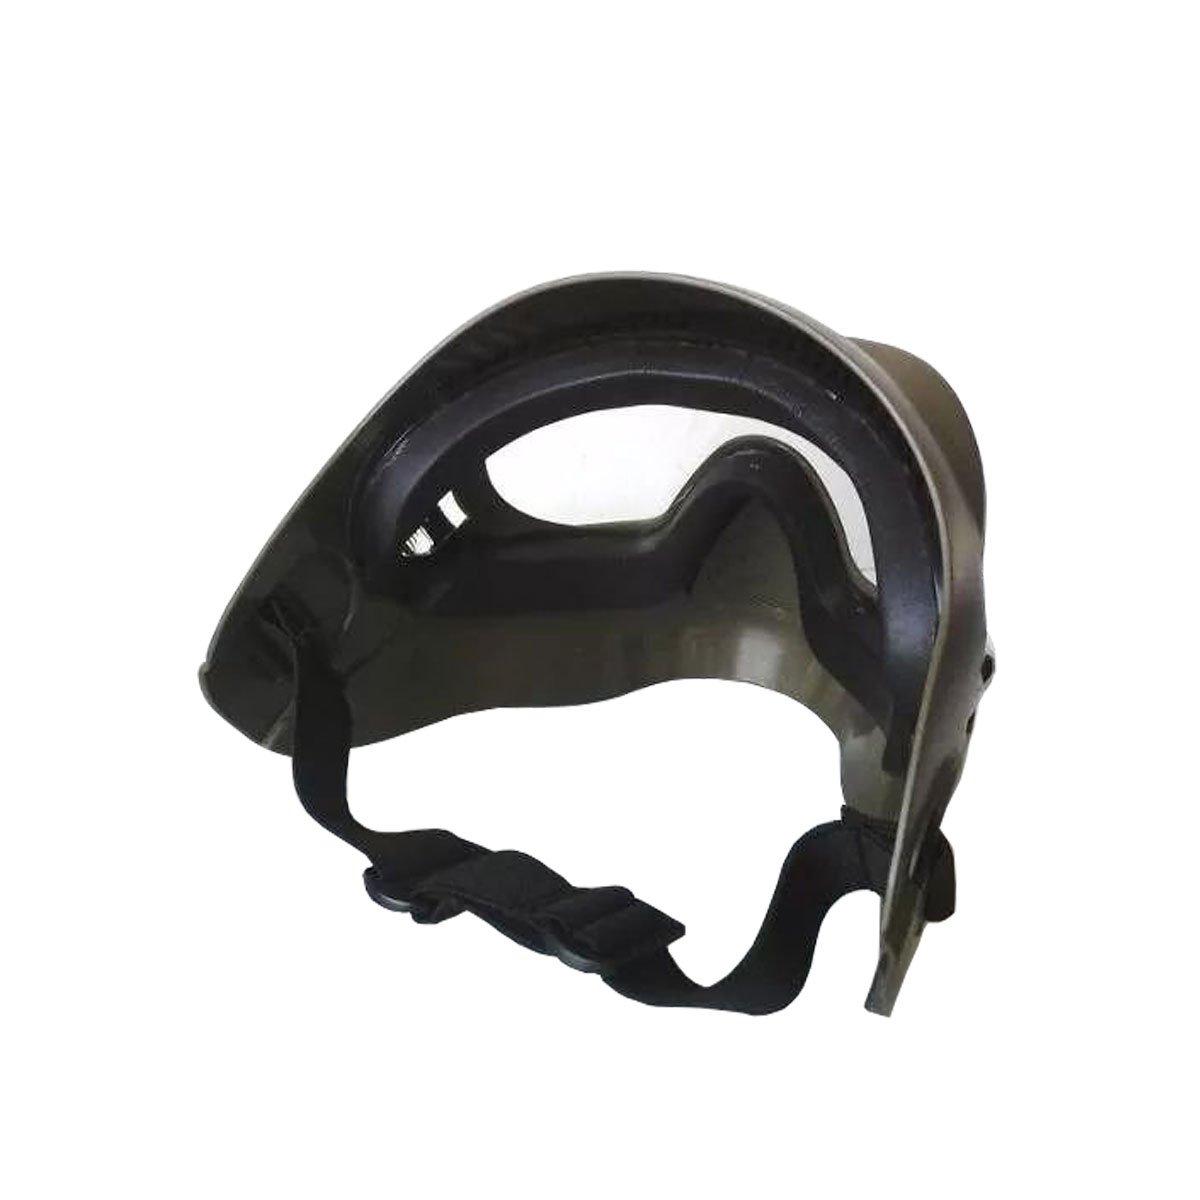 Mascara Ram Olive  Verde  H1-1 para Airsoft / Paintball